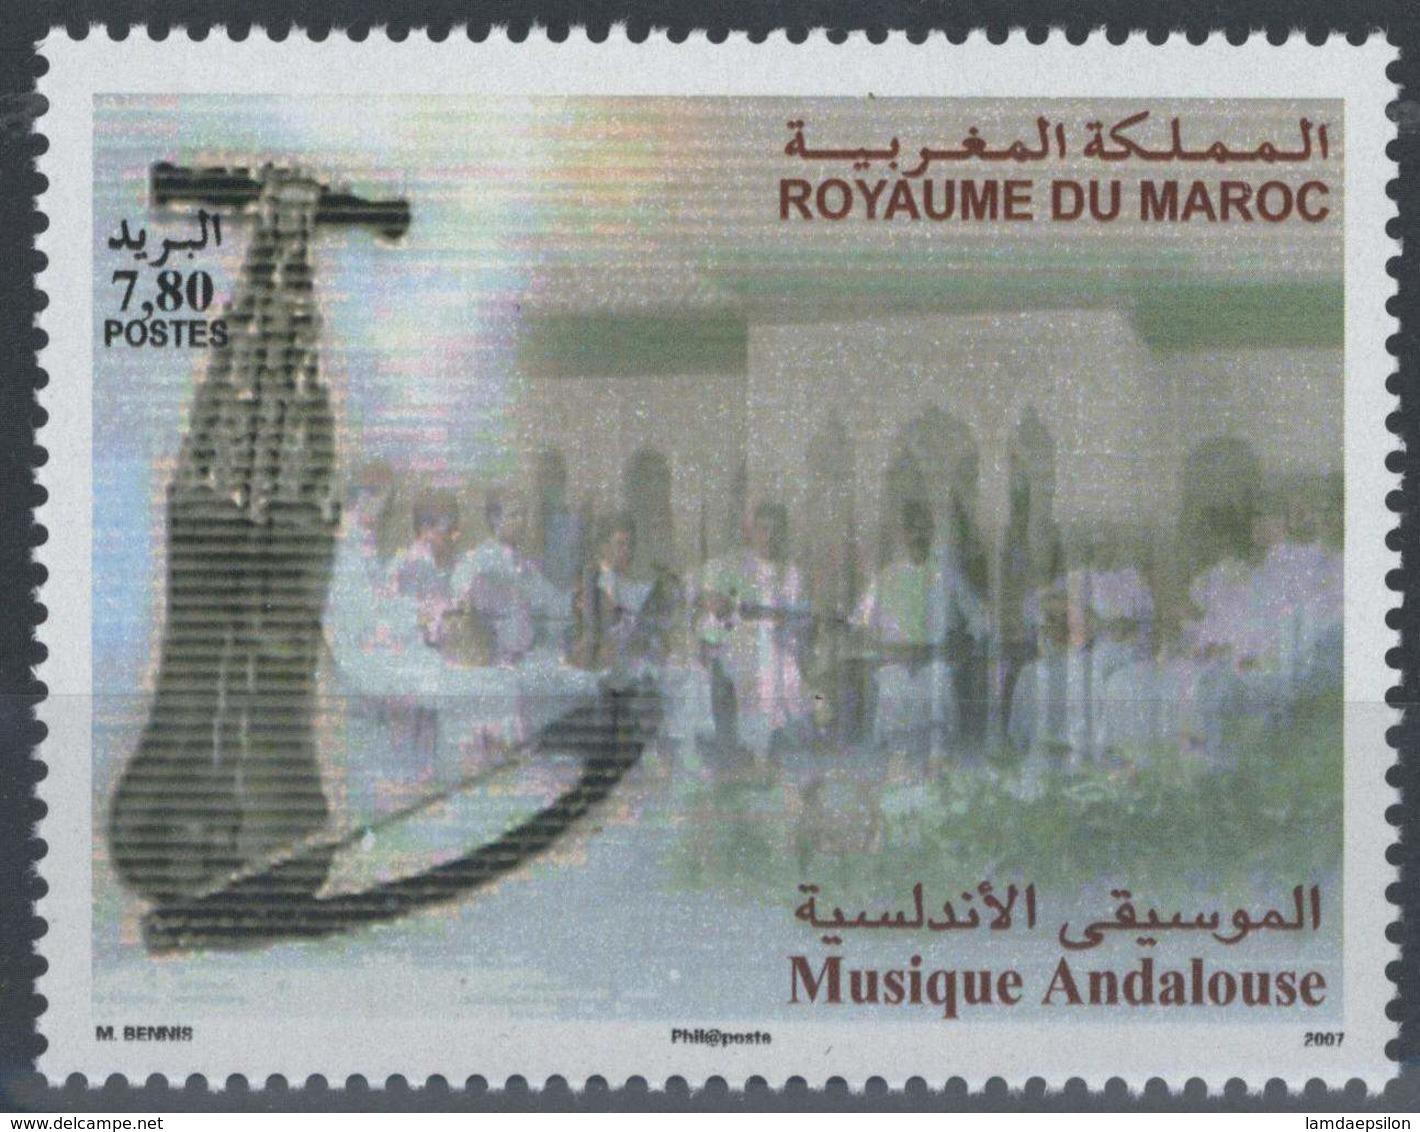 MOROCCO LA MUSIQUE ANDALOUSE 2007 - Morocco (1956-...)